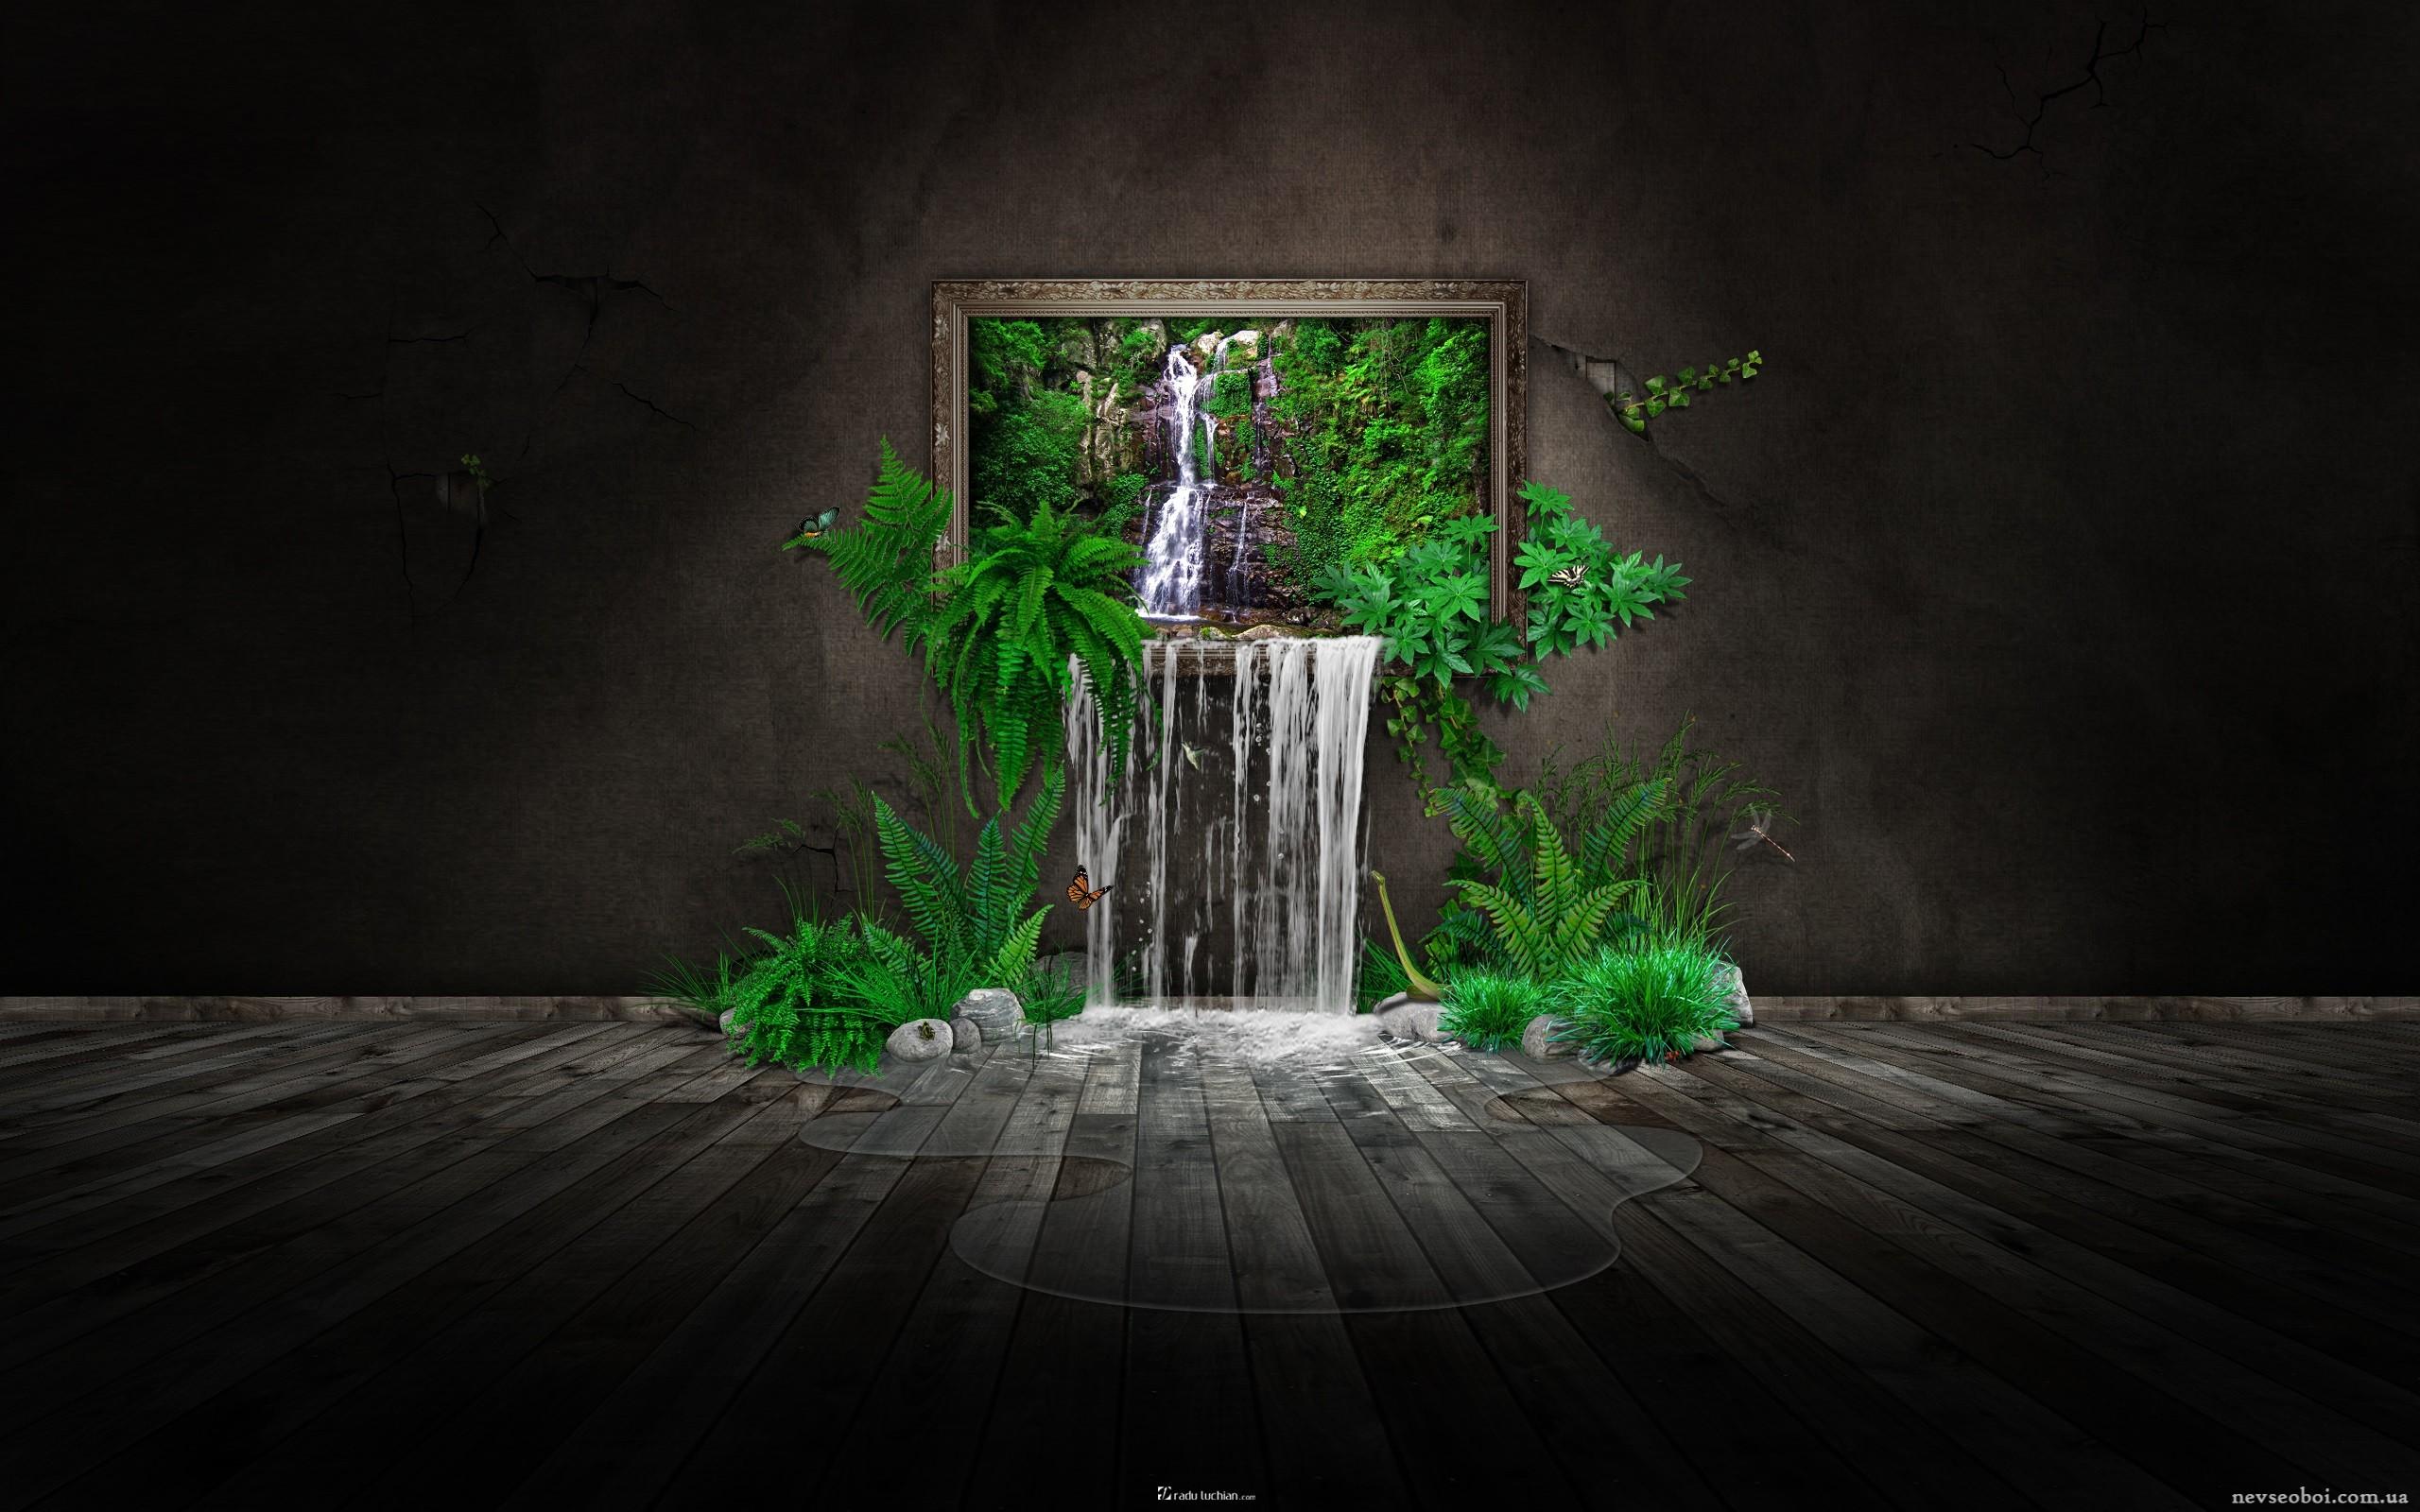 Fondos de pantalla : paisaje, arte digital, noche, CGI, verde ...